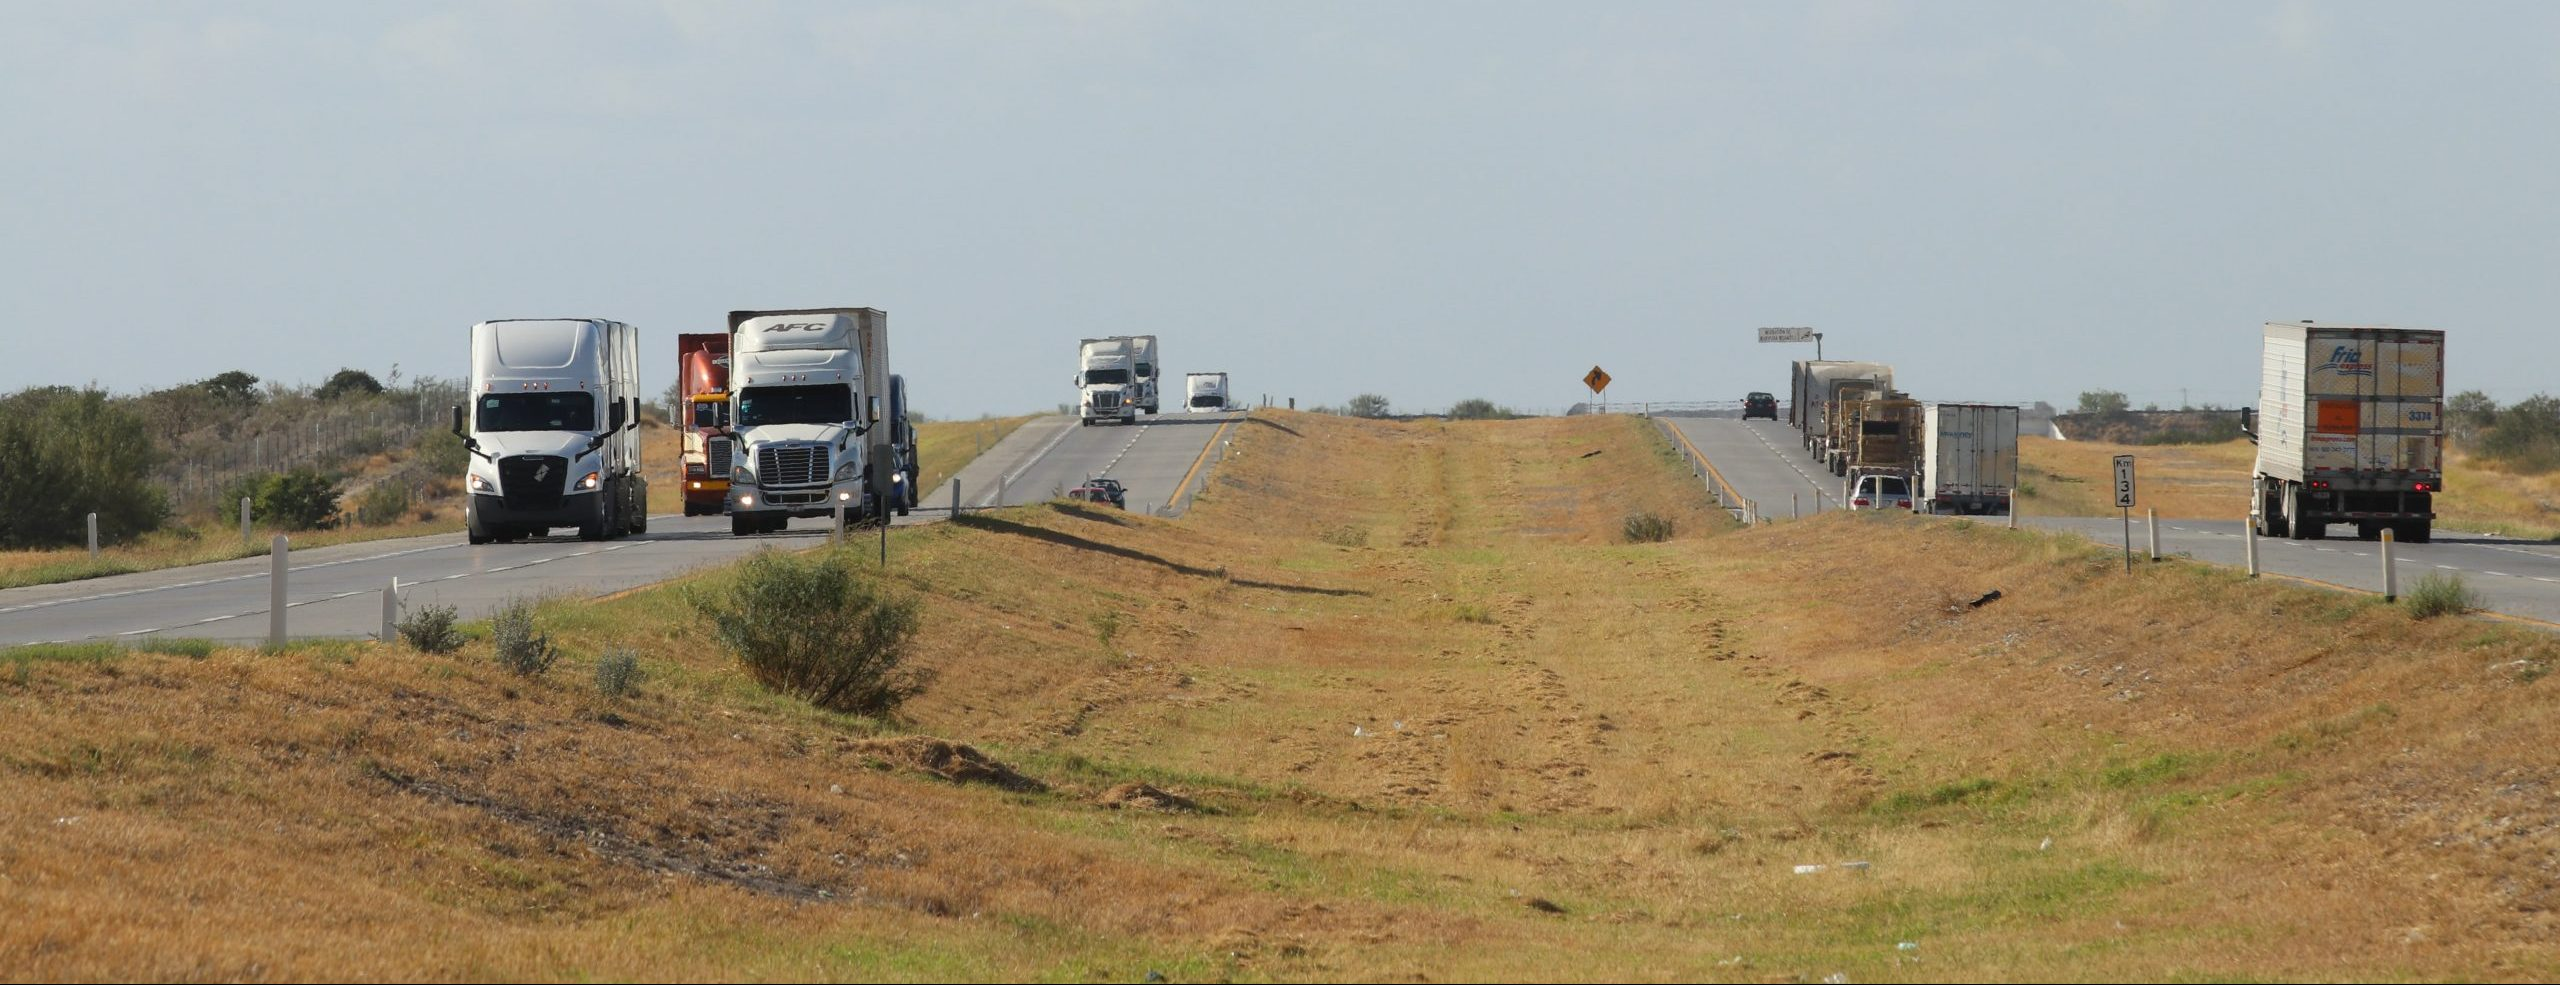 Autotransporte en México